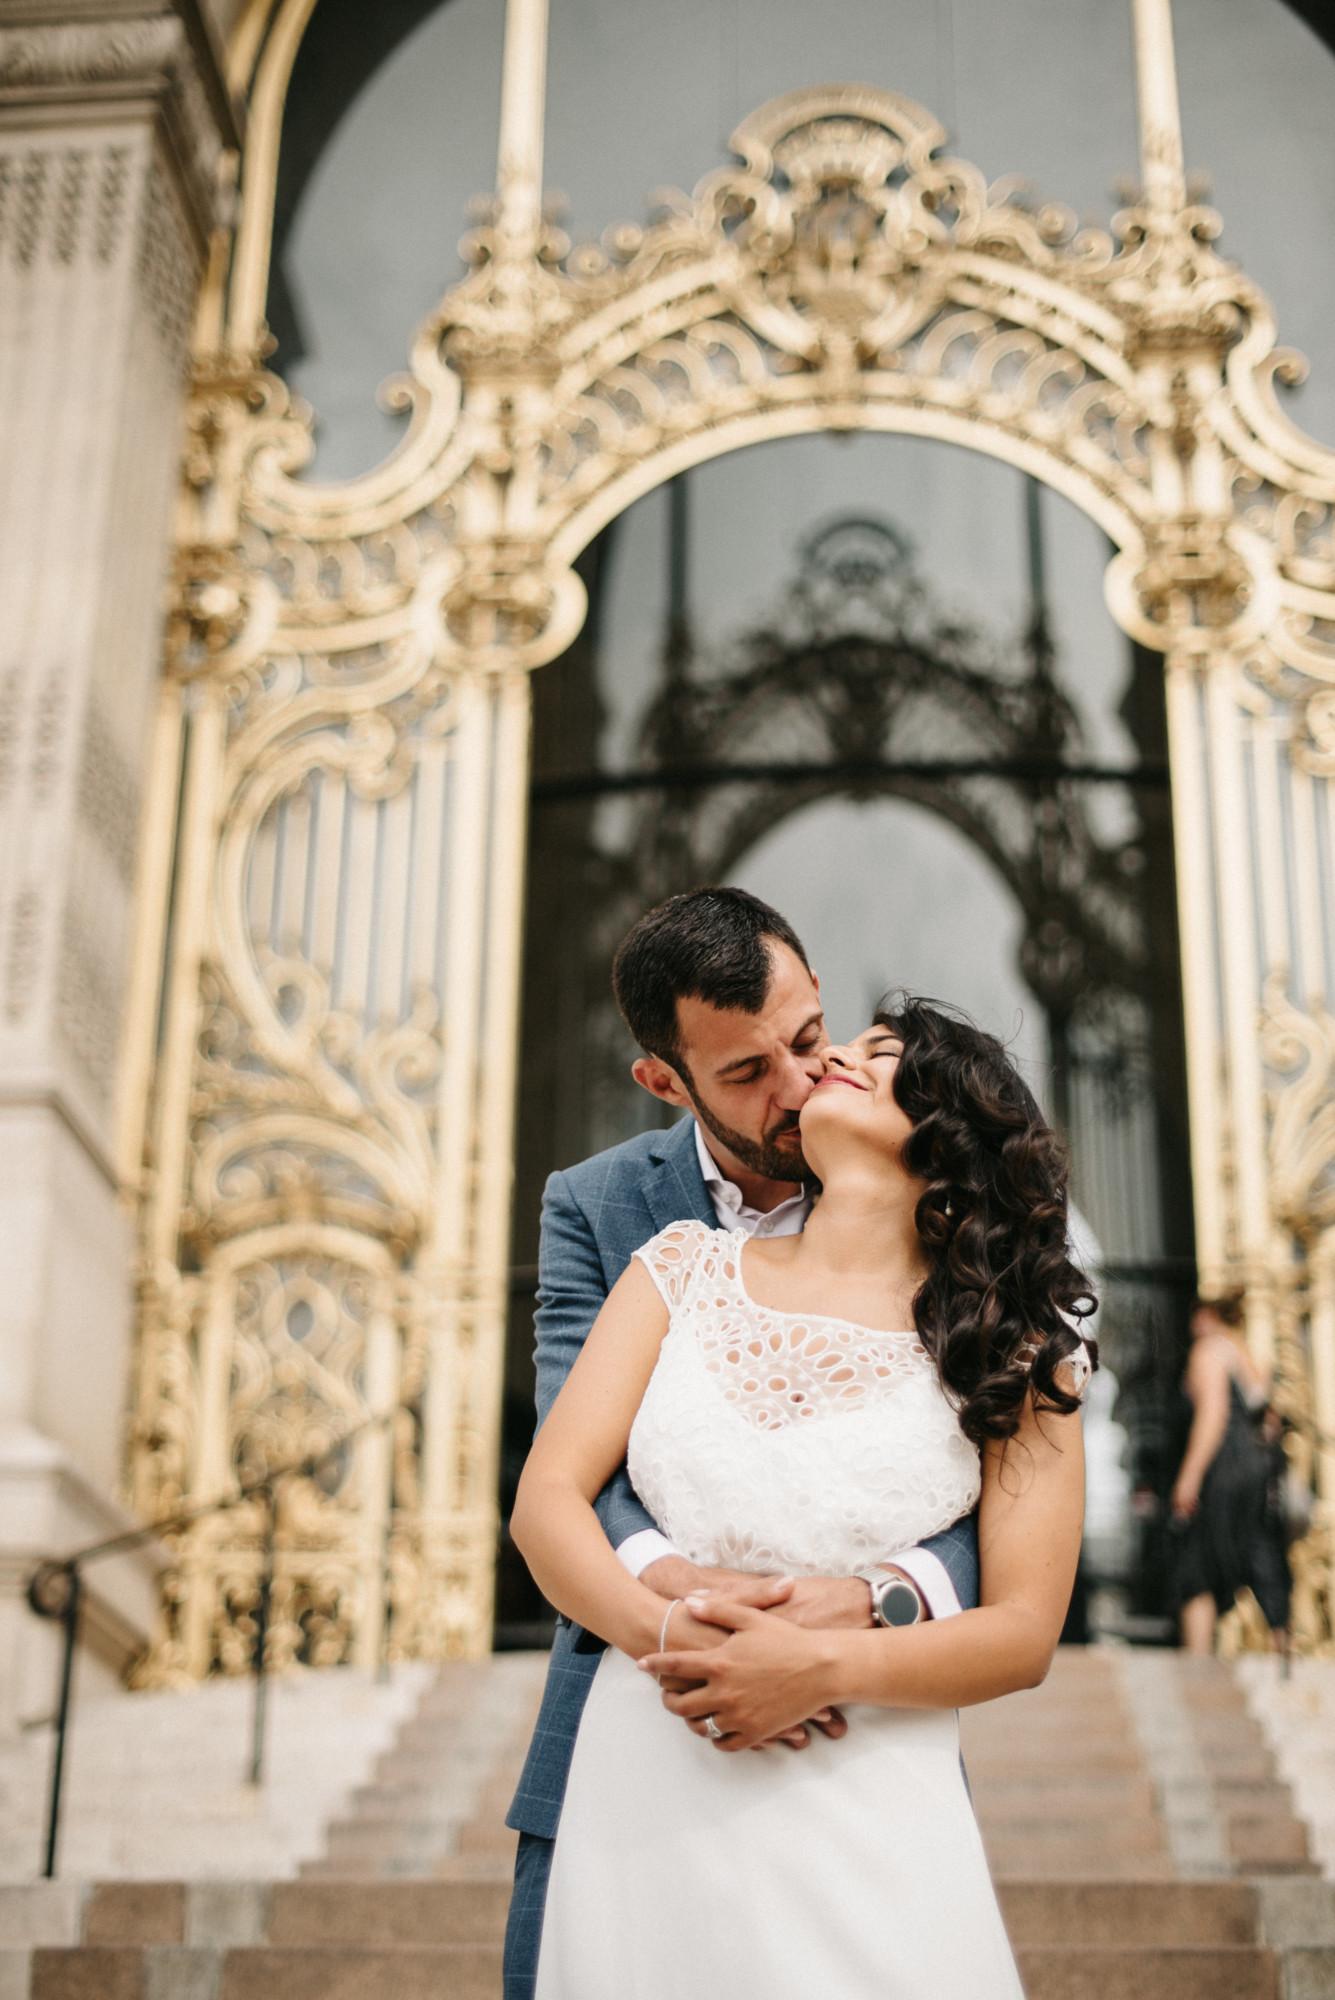 Paris, mariage, fleuriste, wedding design, fleuriste, bouquet de mariée, bride, wedding